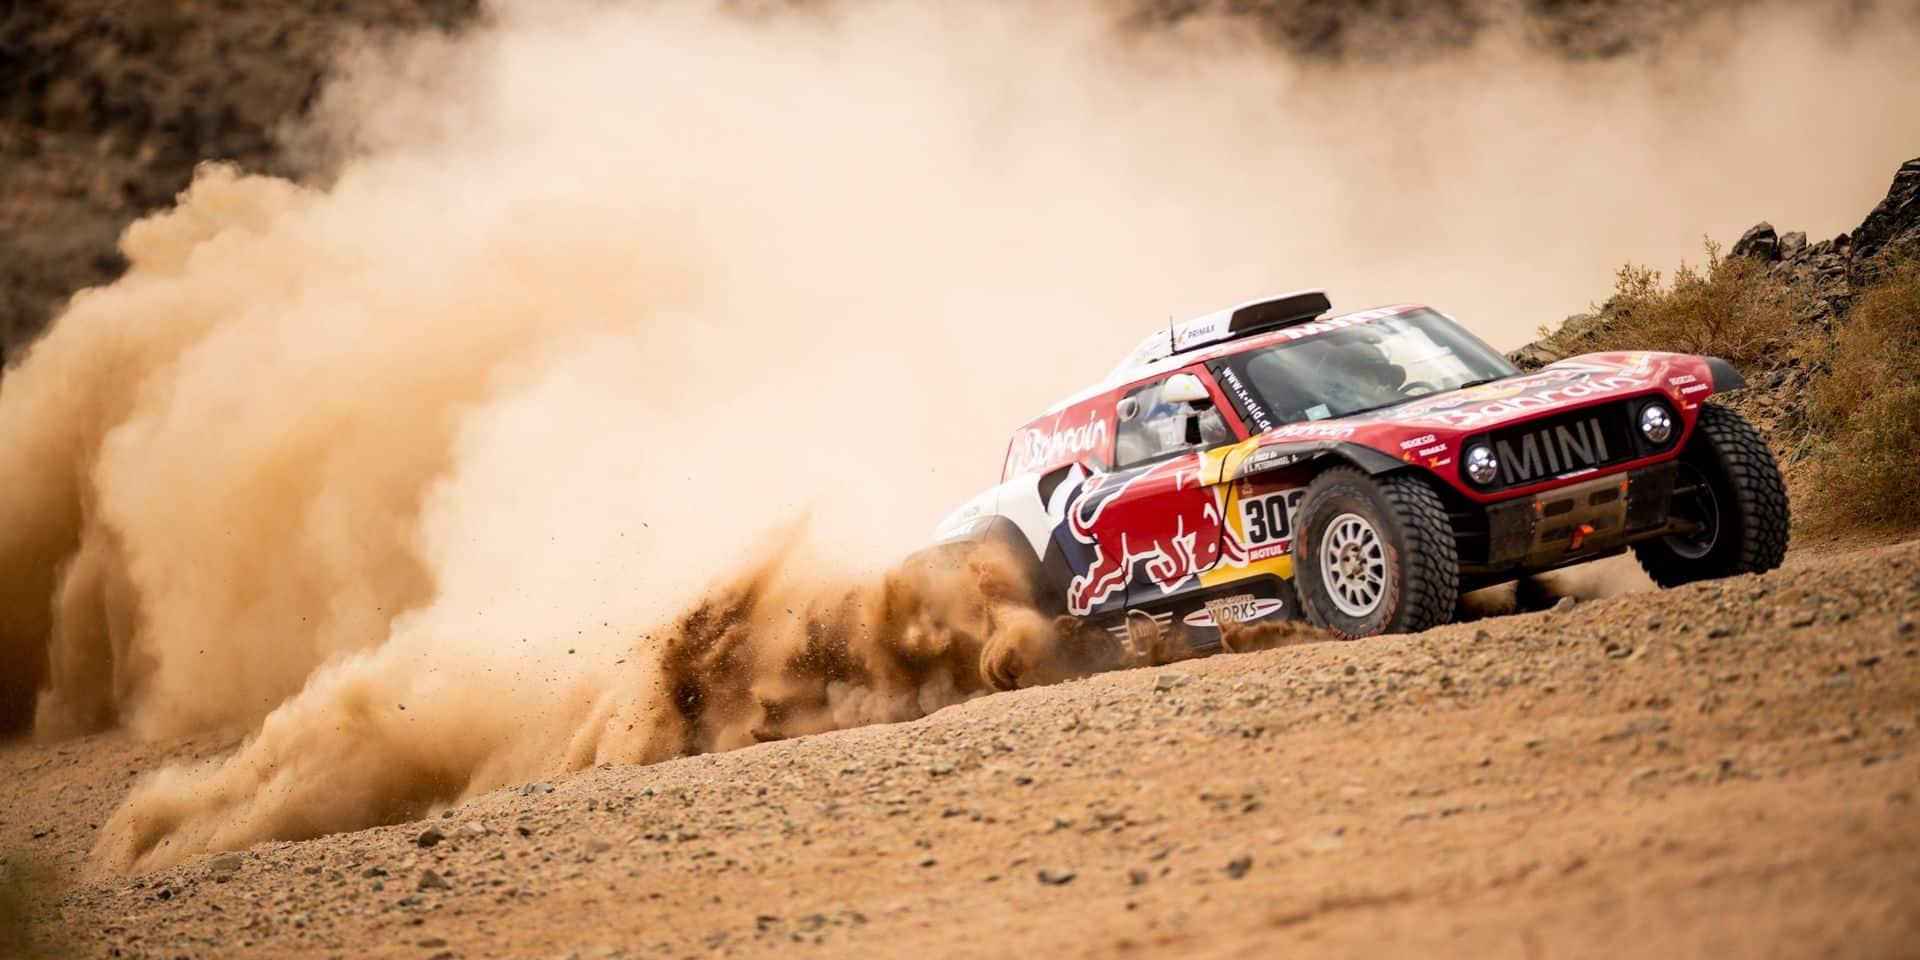 Dakar - Étape 4 (Autos) : Peterhansel s'impose, Al-Attiyah sanctionné